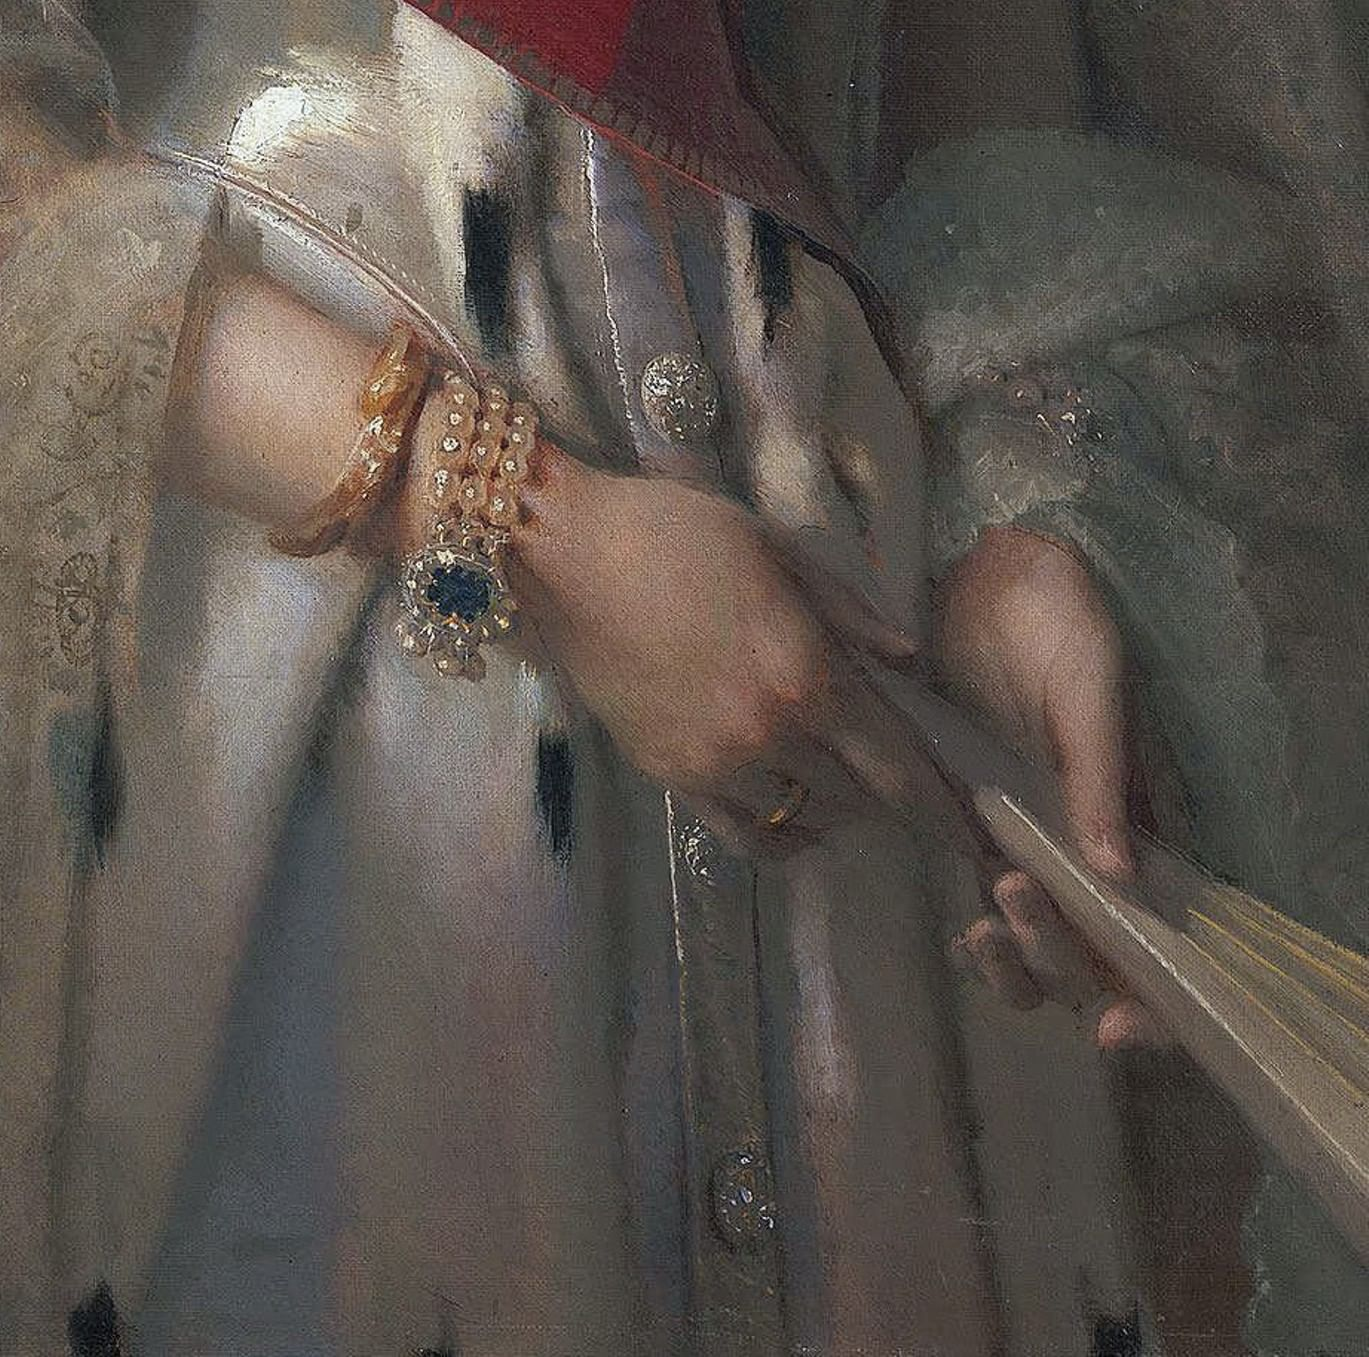 Драгоценности императриц от Рокотова до Кустодиева. Галерея 3. Мария Федоровна